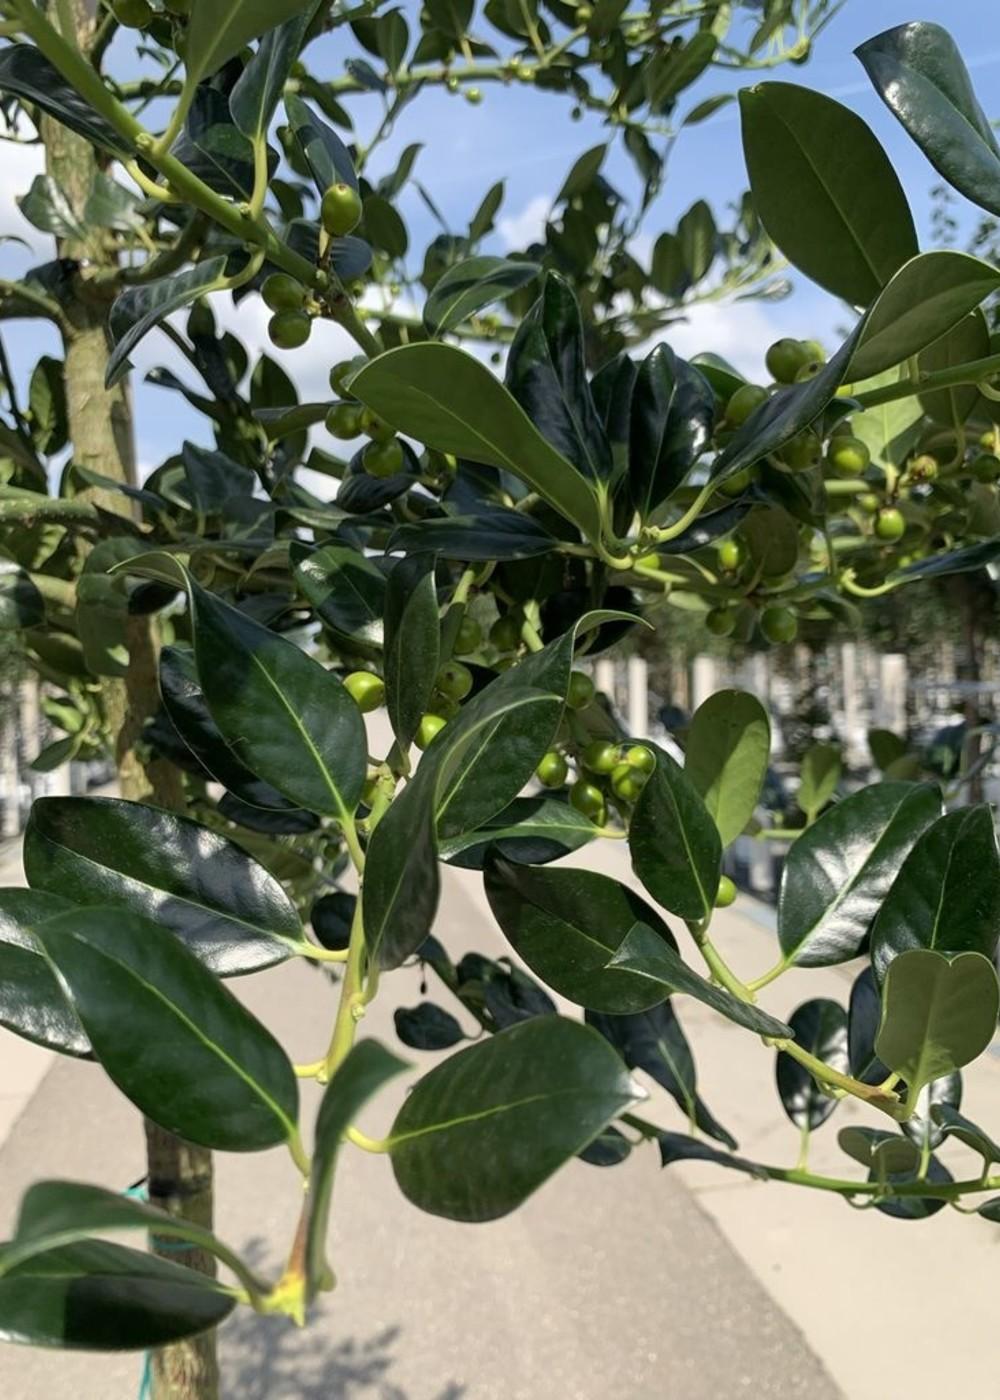 Alaska-Stechpalme Bonsai-Formschnitt   Ilex aquifolium 'Alaska'